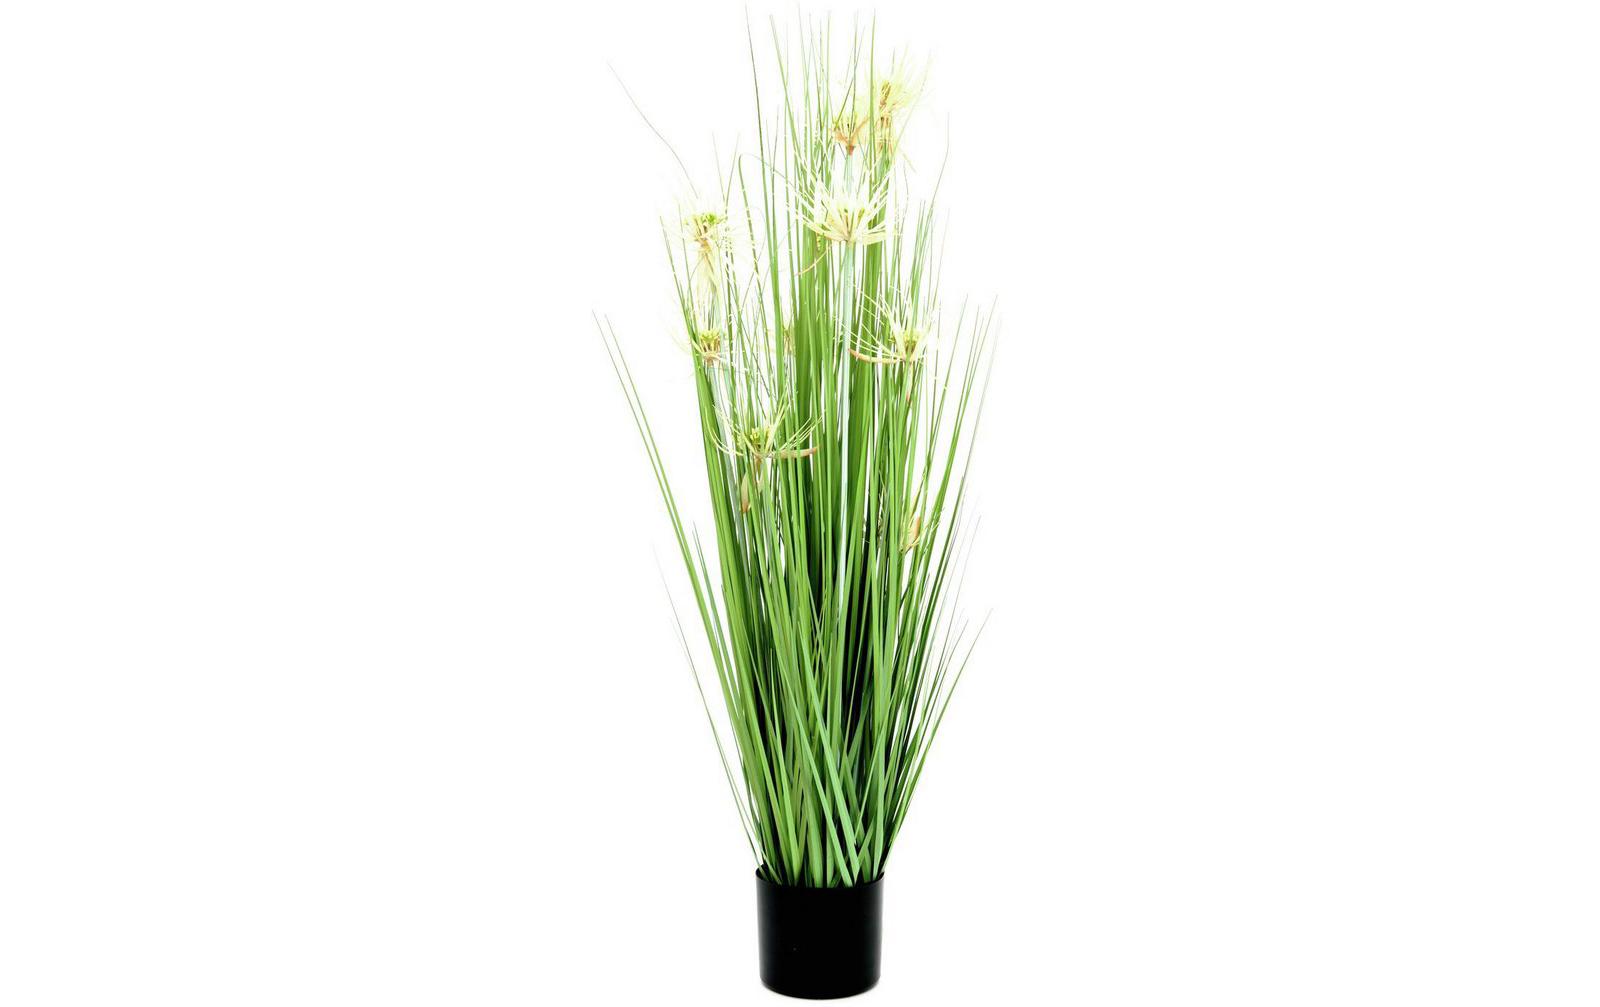 europalms-sterngras-105cm-kunststoffpflanze